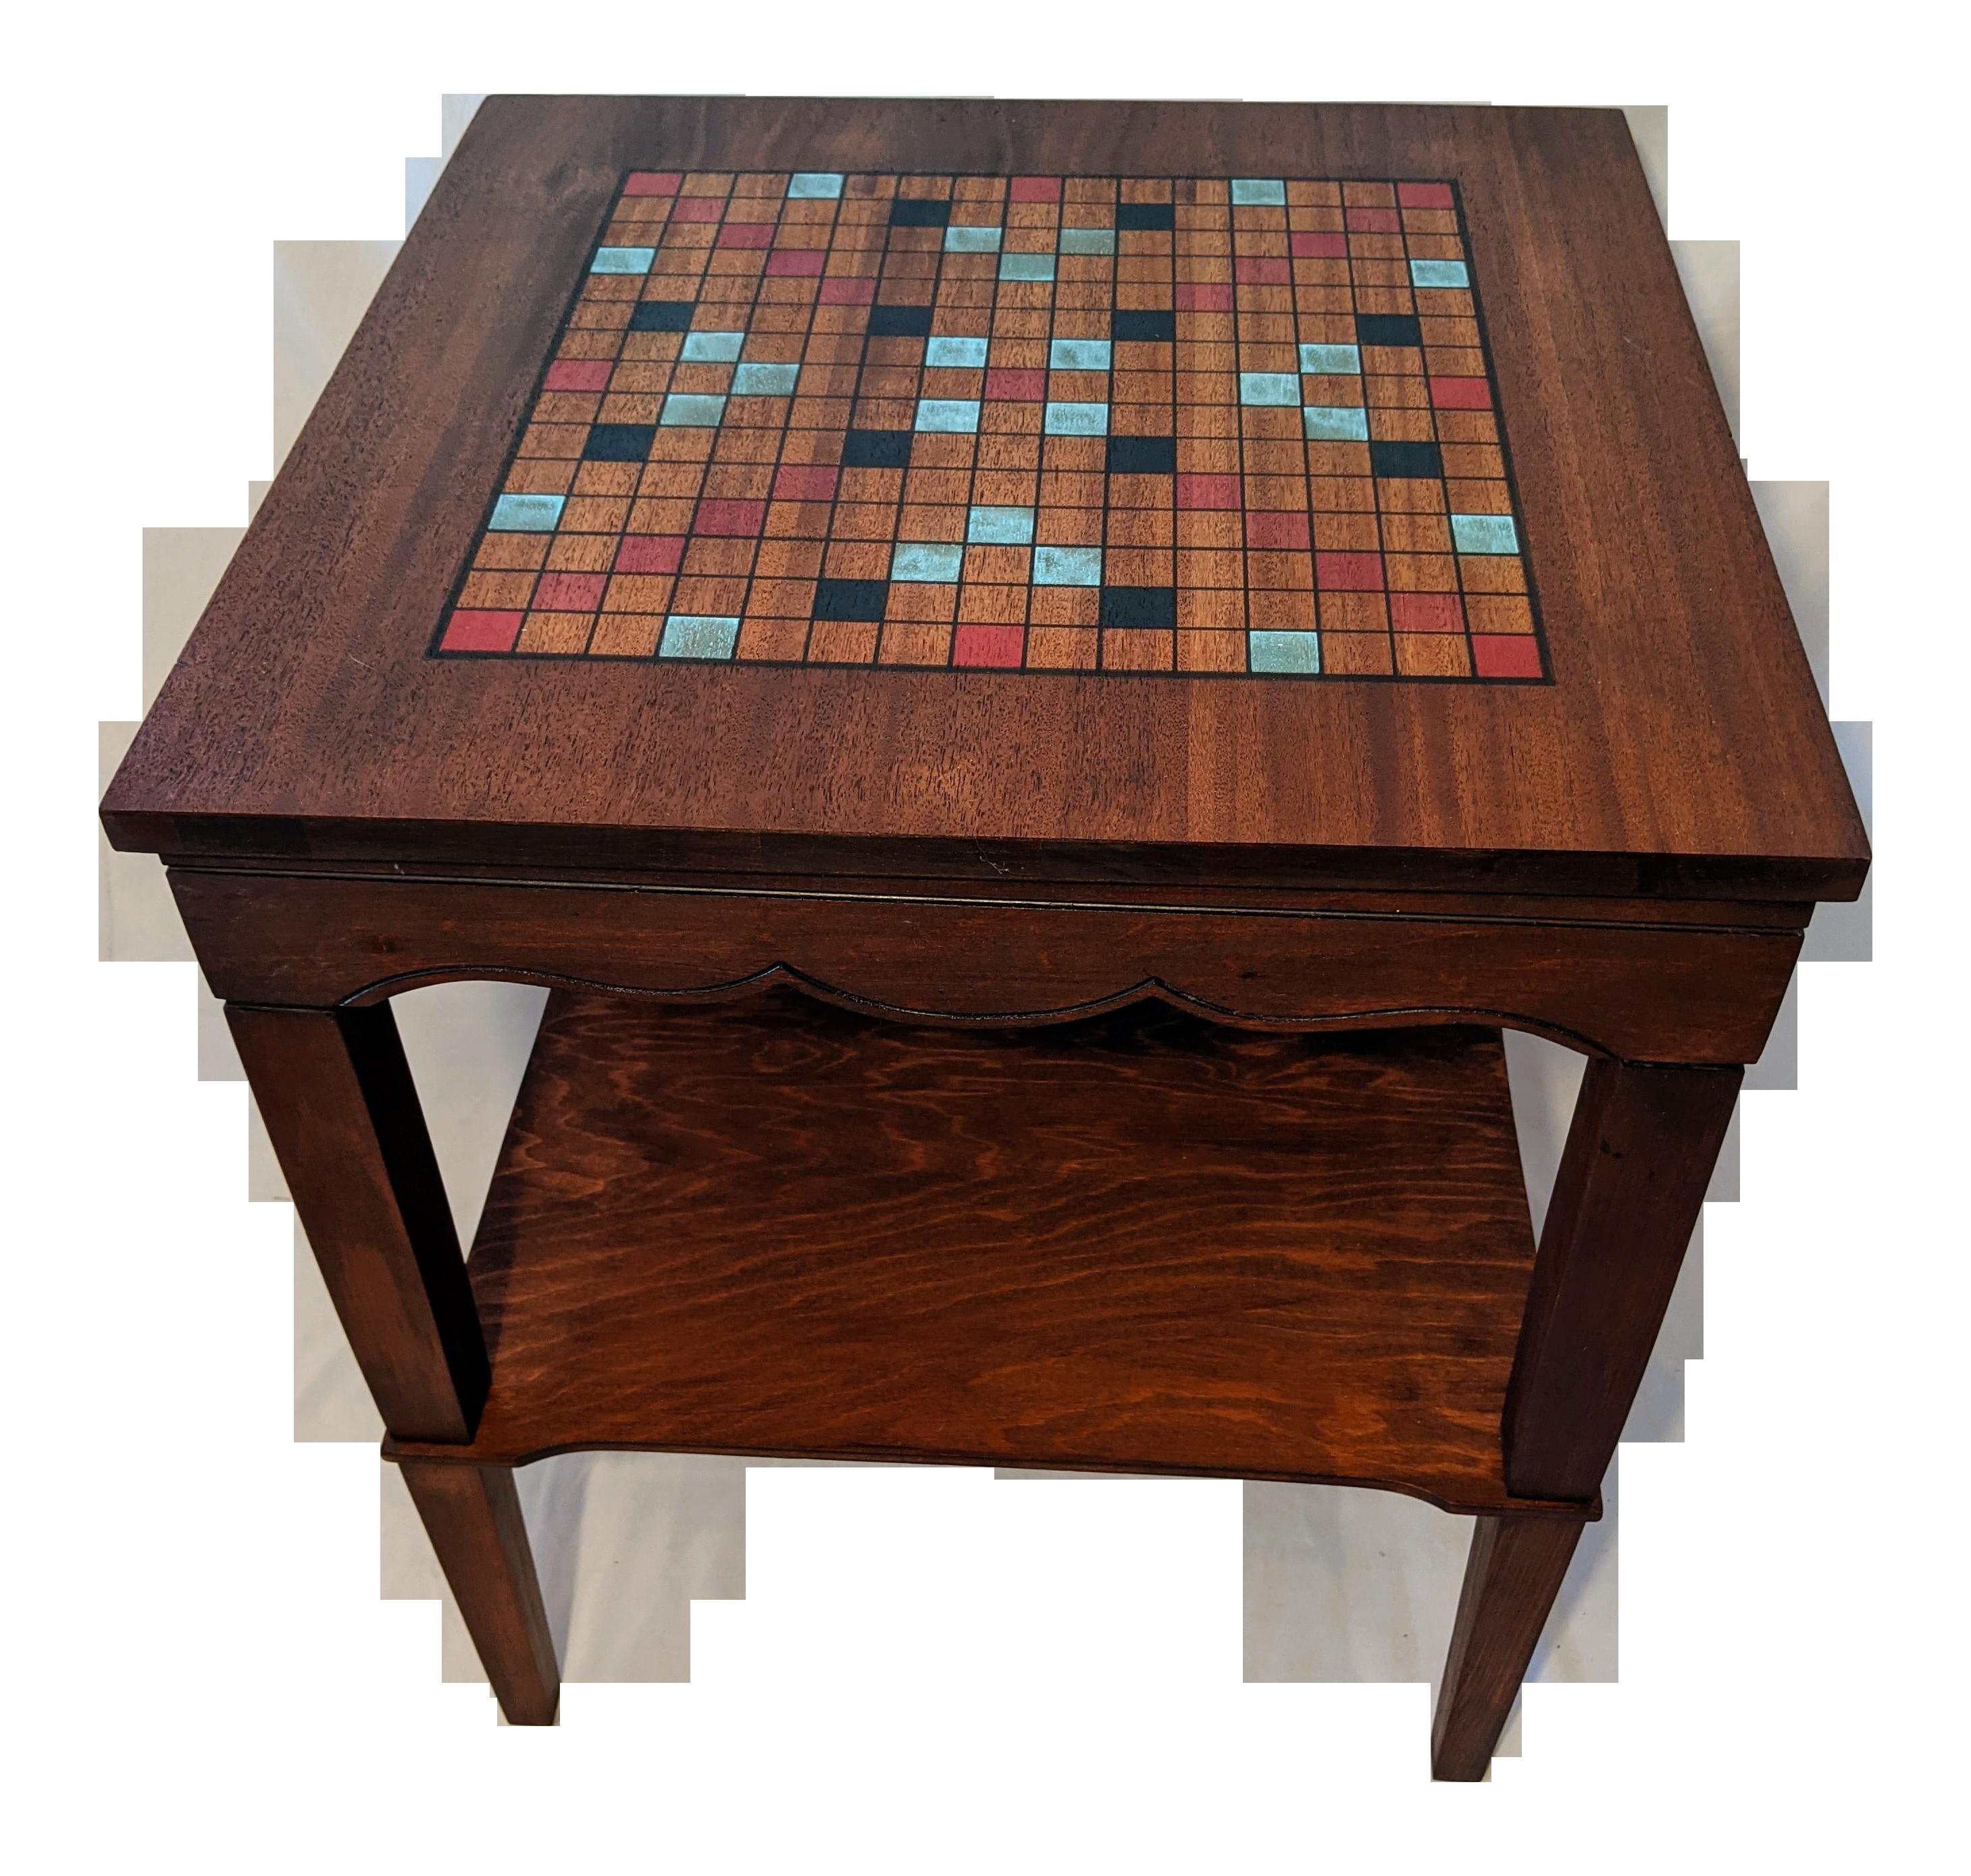 Vintage Handmade Wooden Spinning Board Game